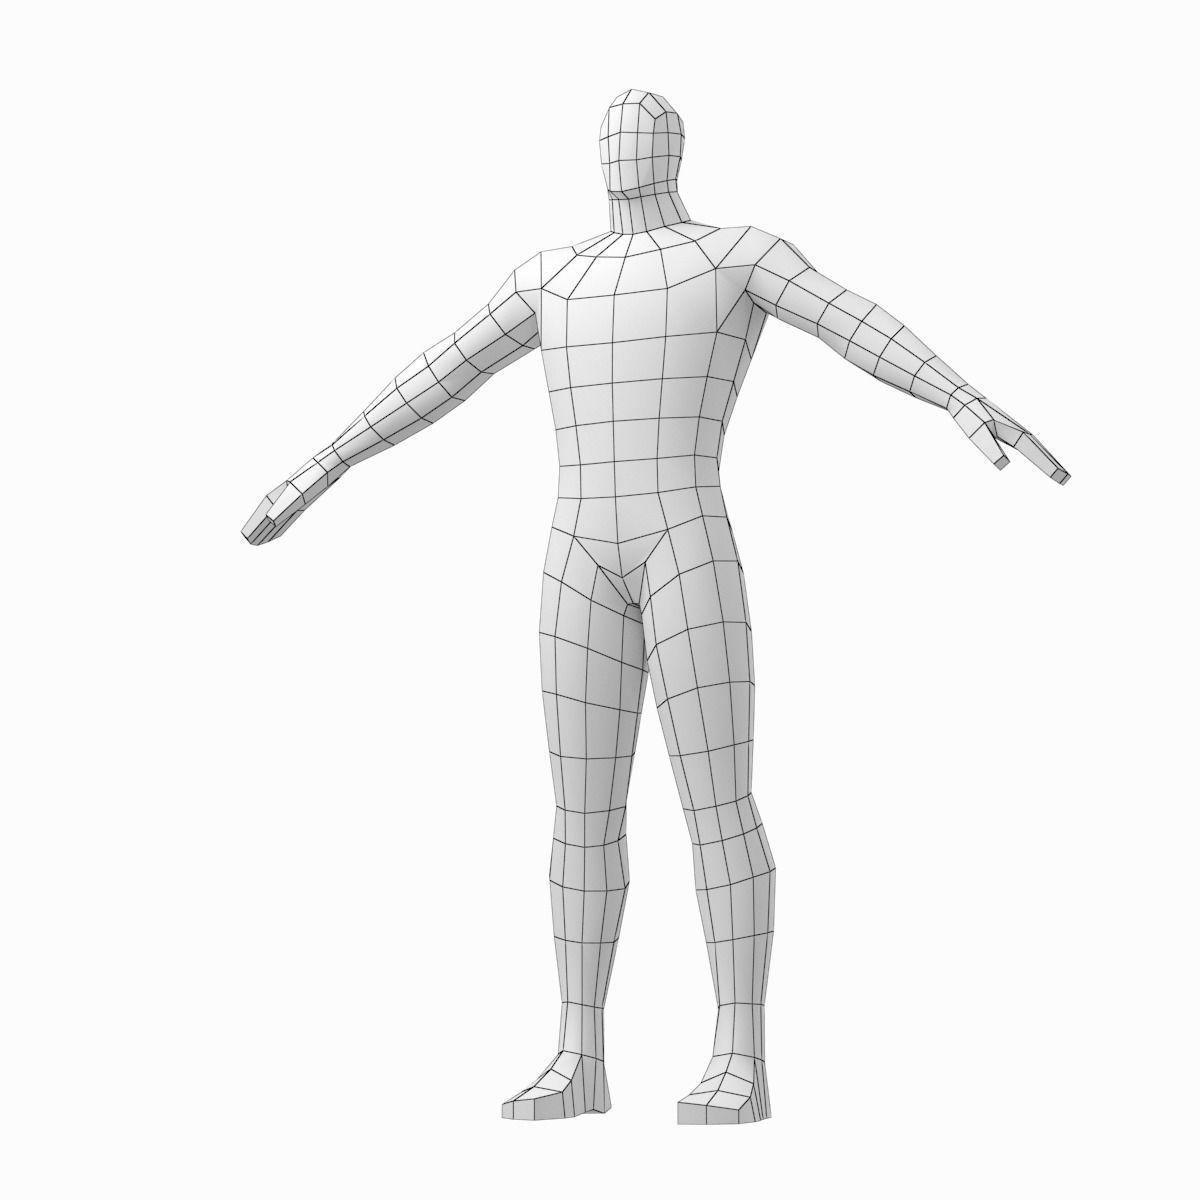 3d Model Male Hero Base Mesh In Three Poses Cgtrader